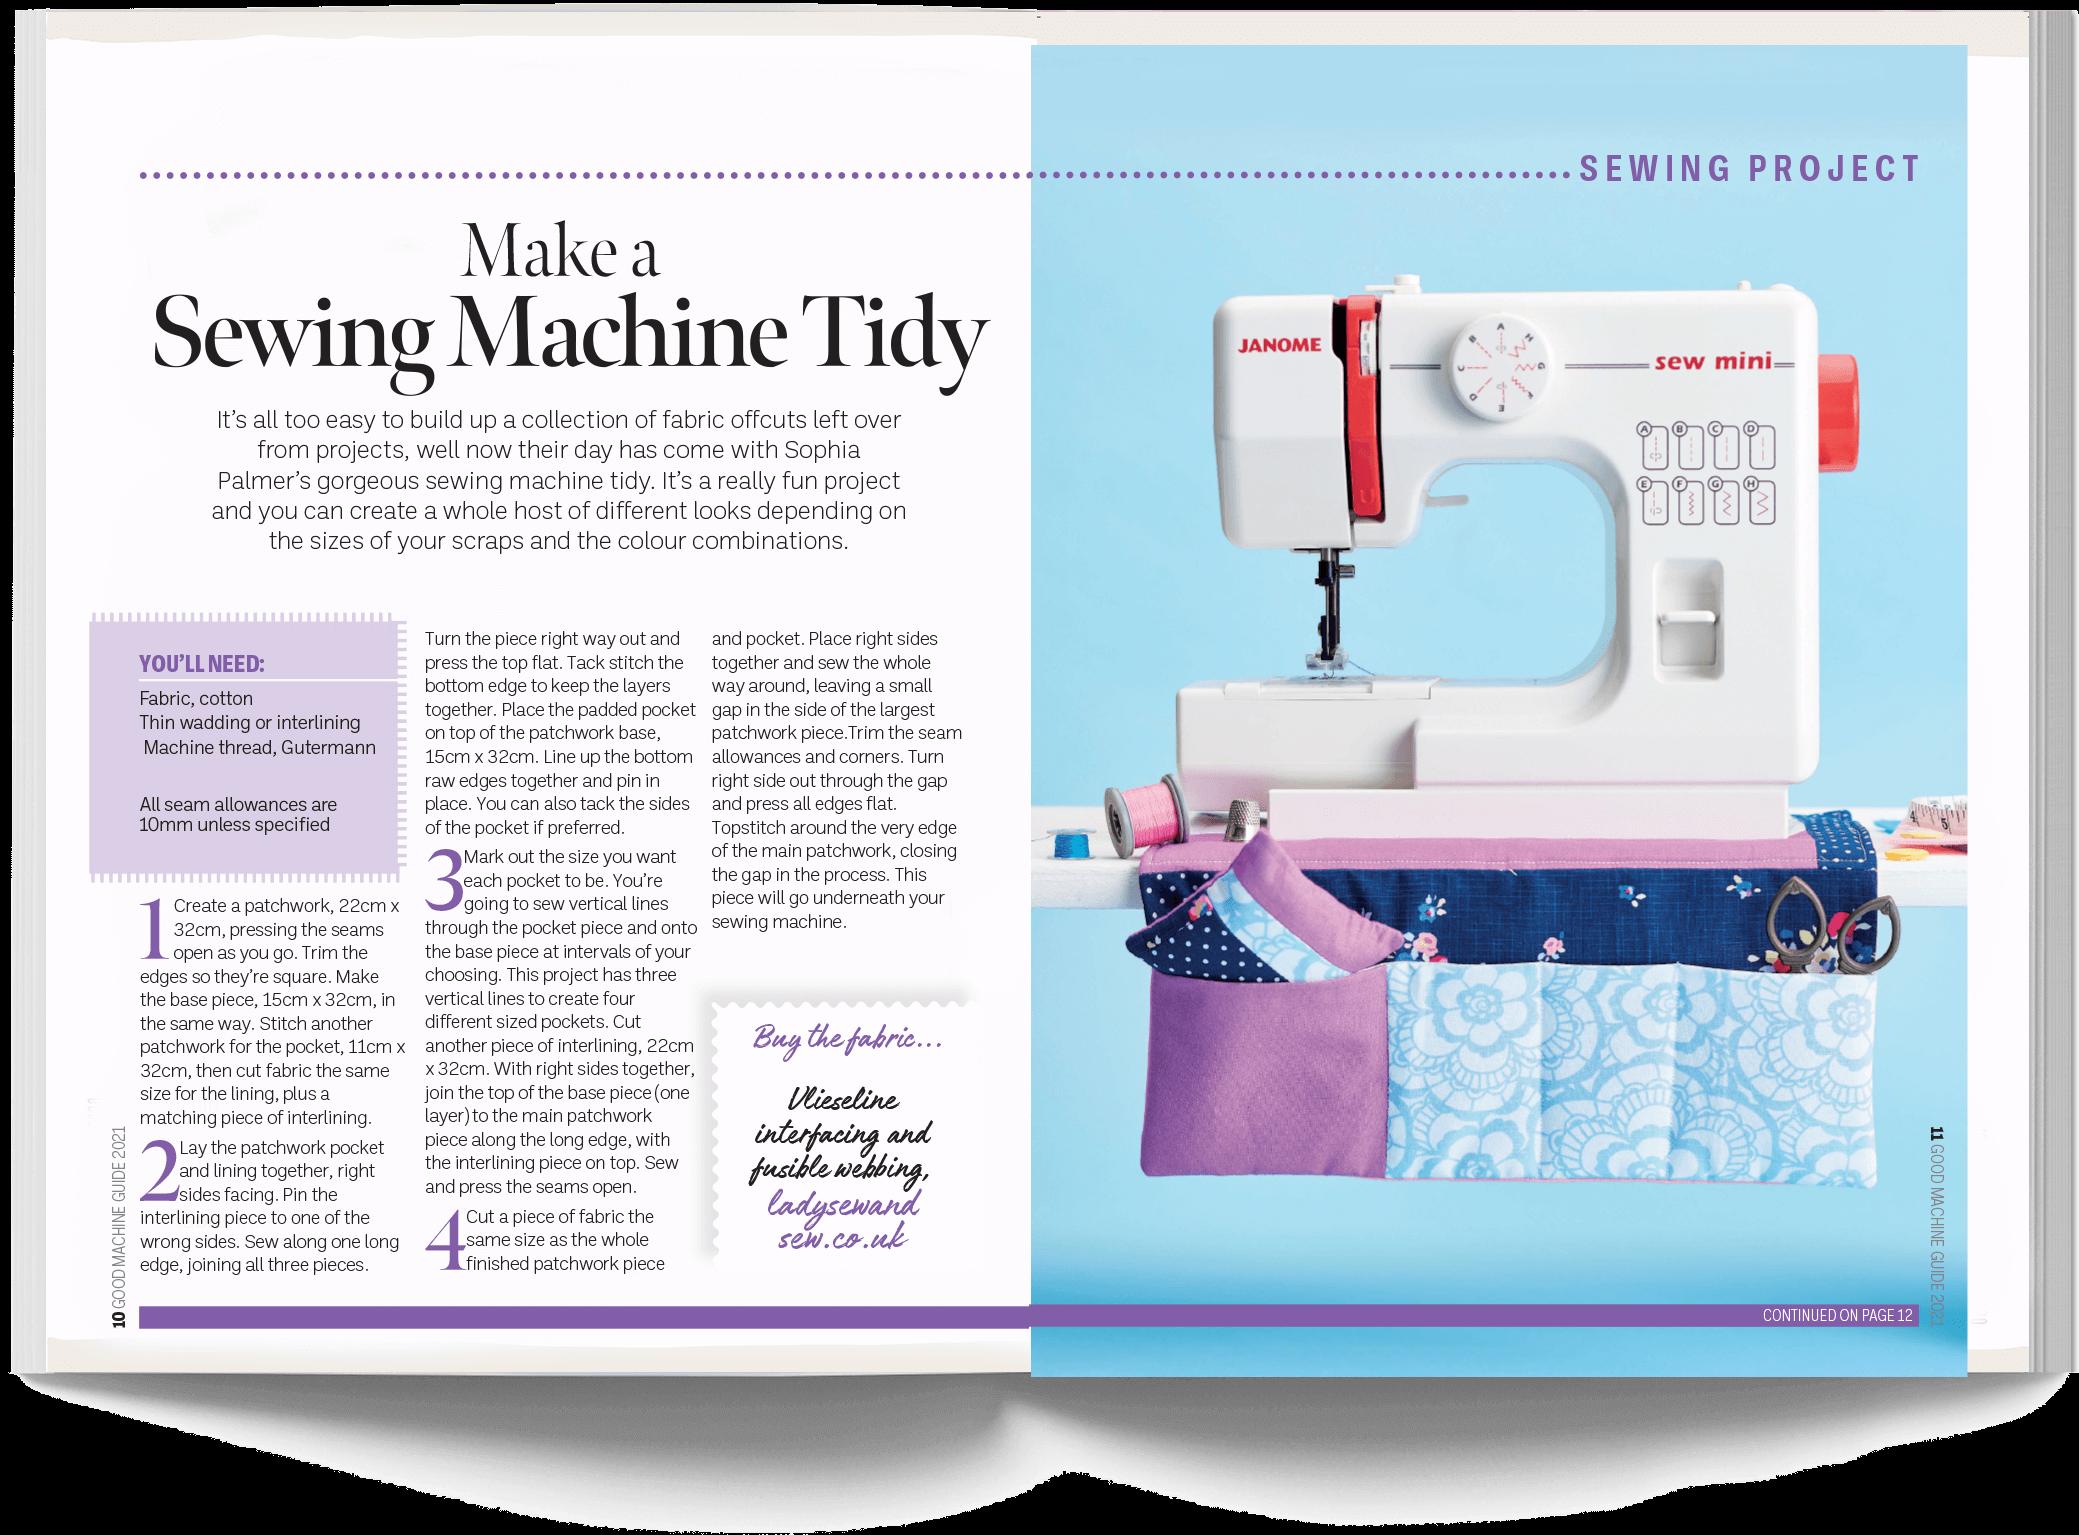 Make a Sewing Machine Tidy